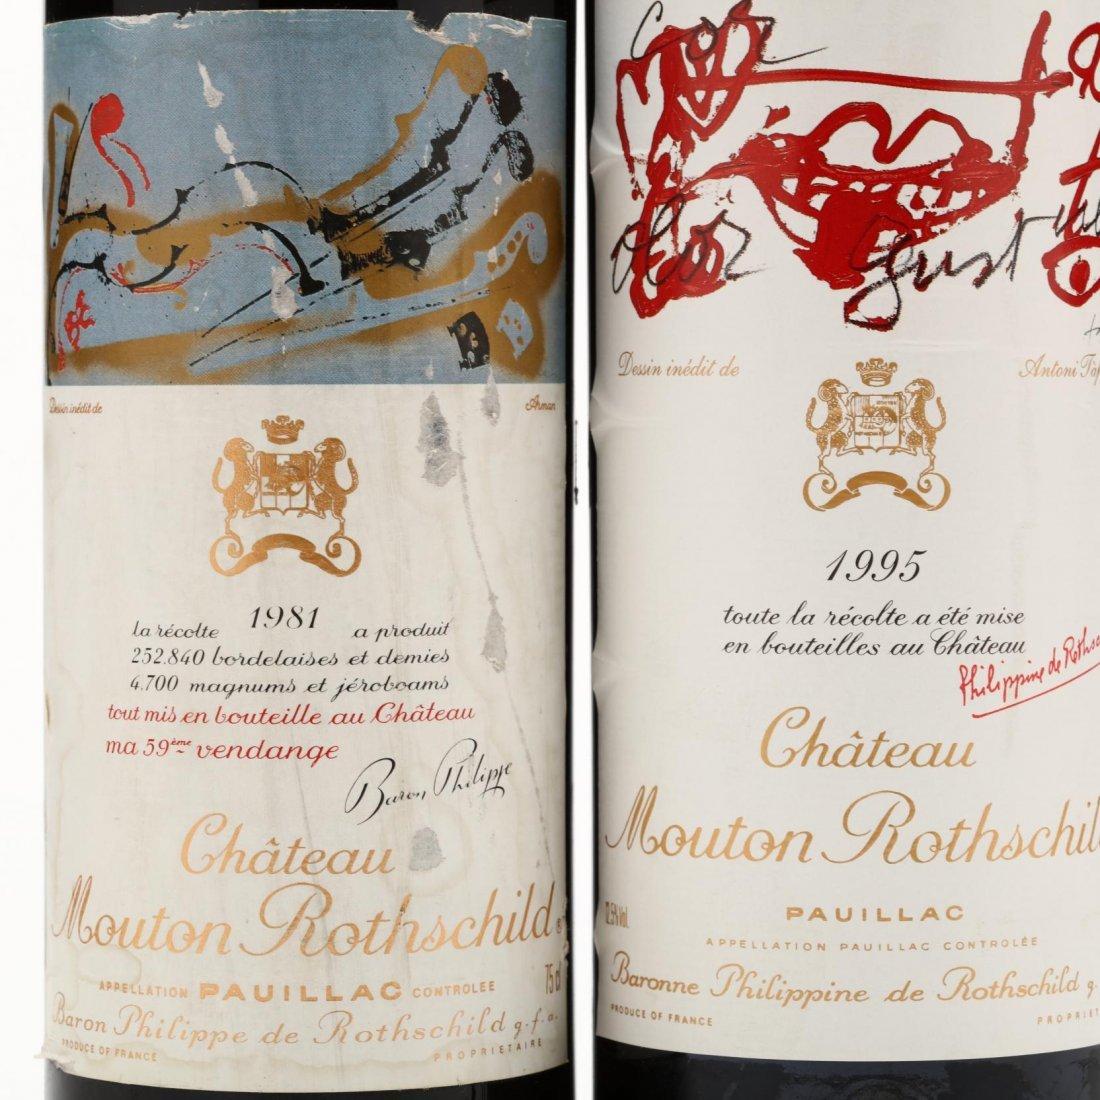 1981 & 1995 Chateau Mouton-Rothschild - 2